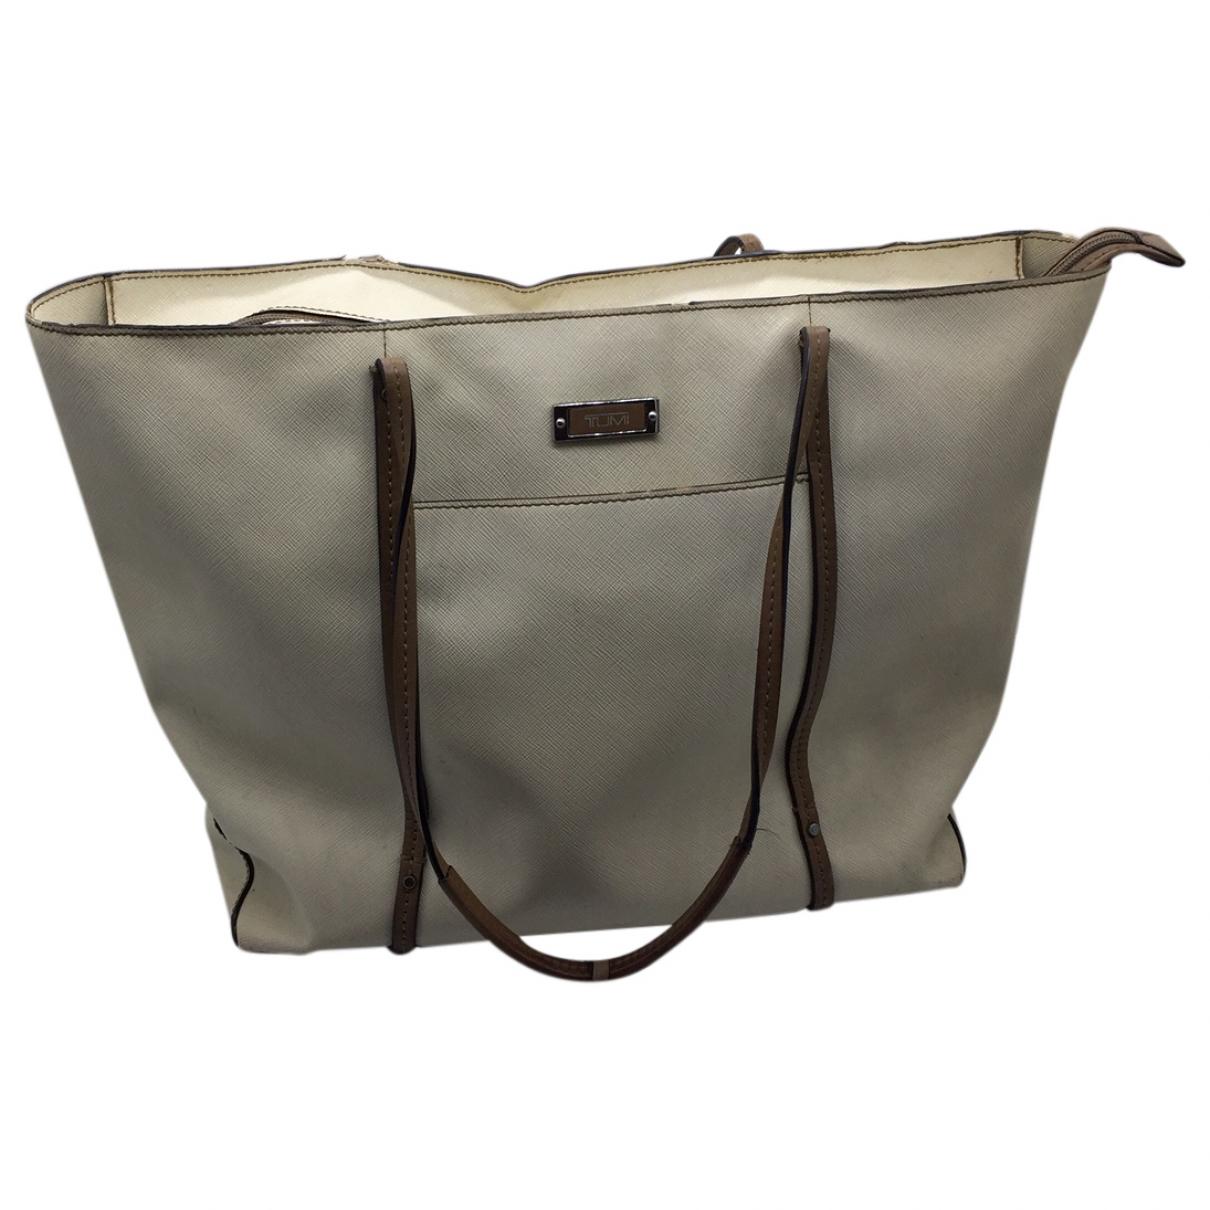 Tumi \N Beige Leather handbag for Women \N